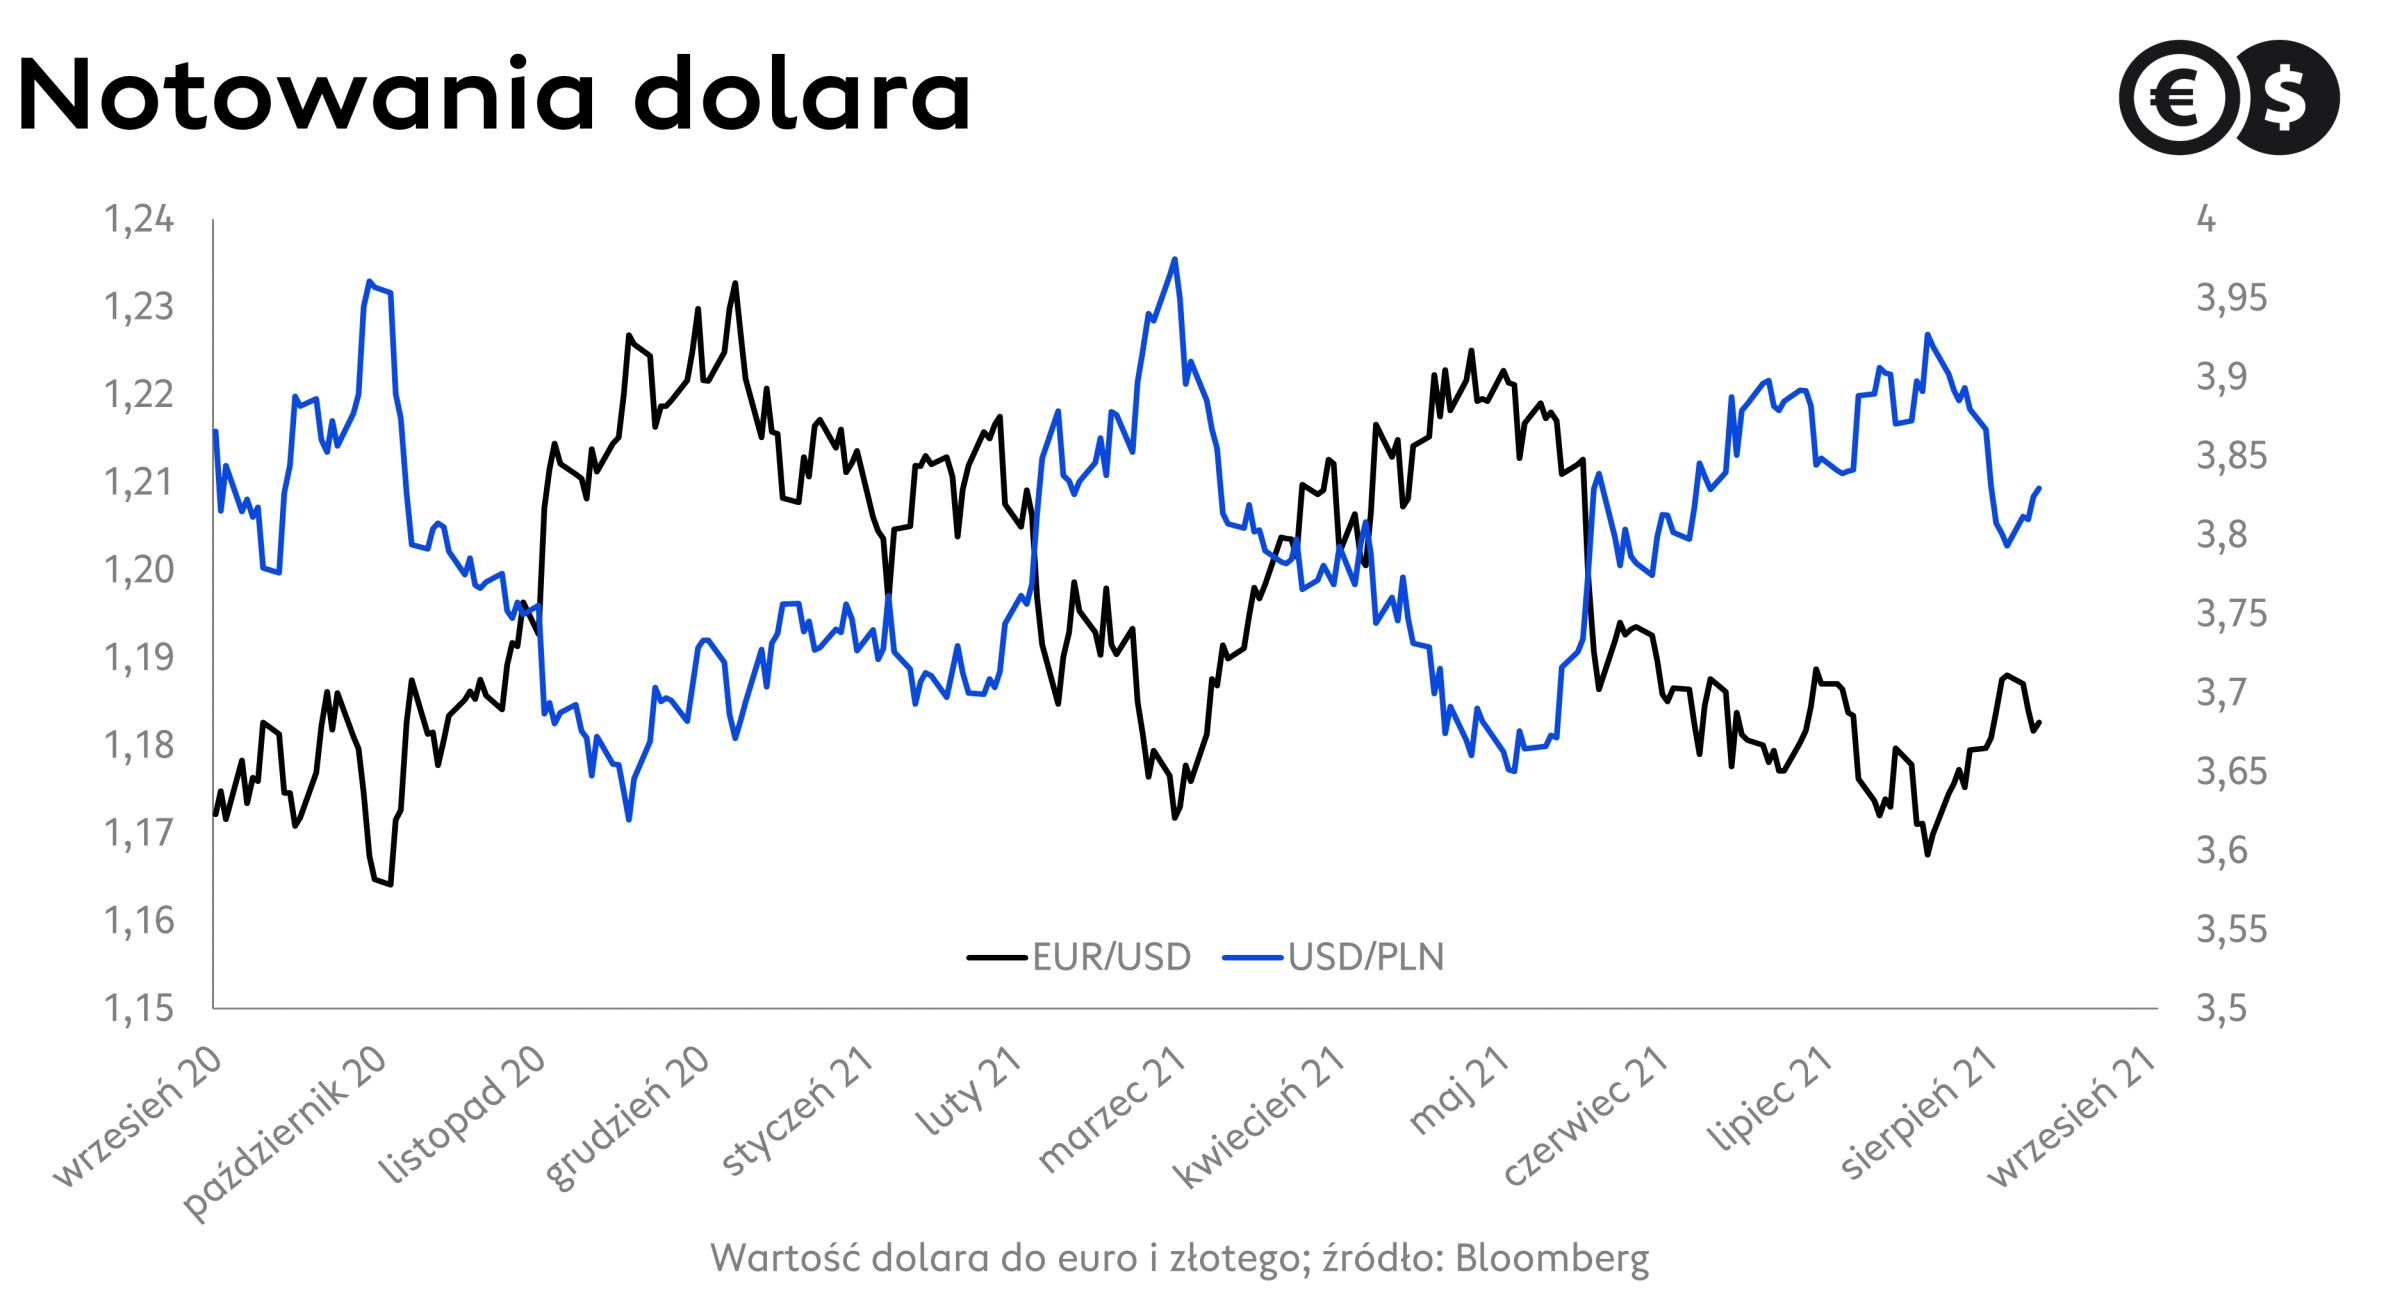 Kurs dolara: wykres USD/PLN i EUR/USD; źródło: Bloomberg